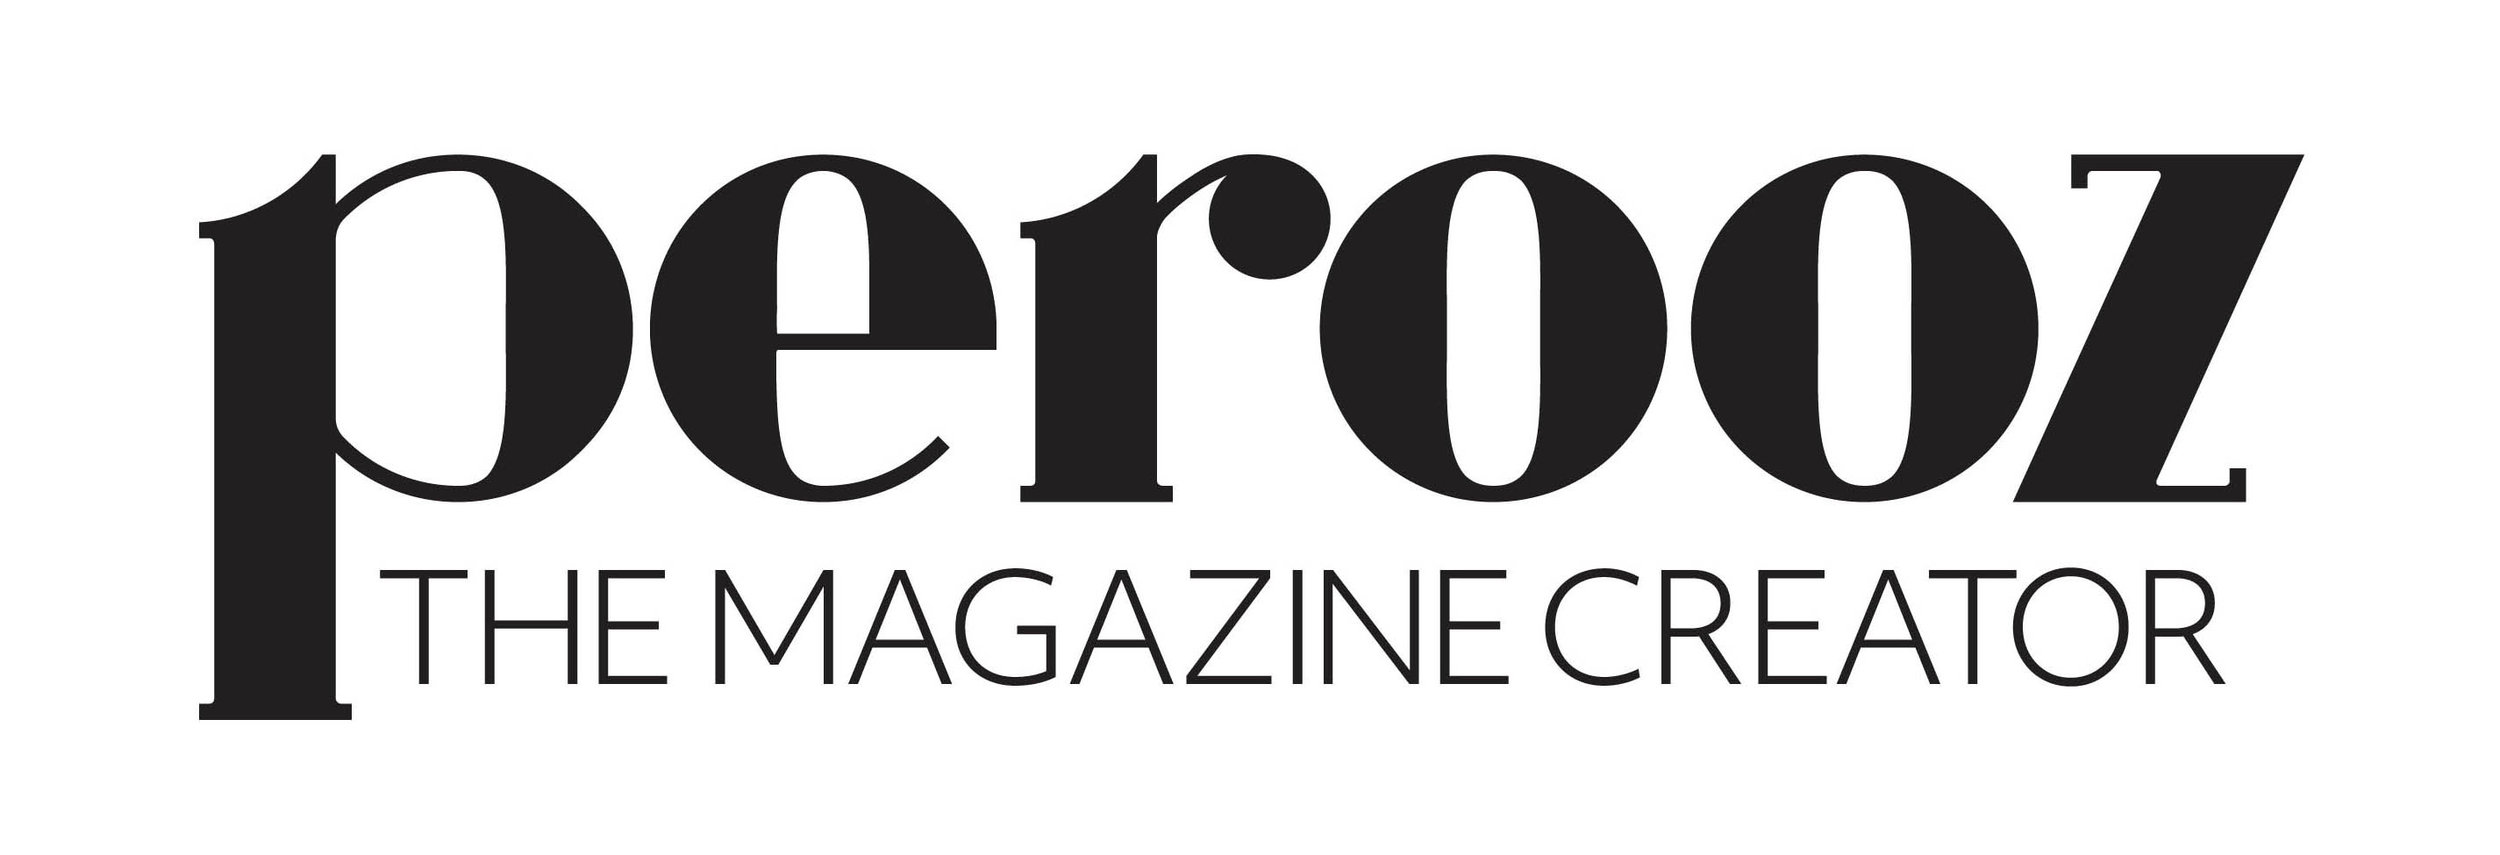 Perooz-TheMagazineCreator_LOGO